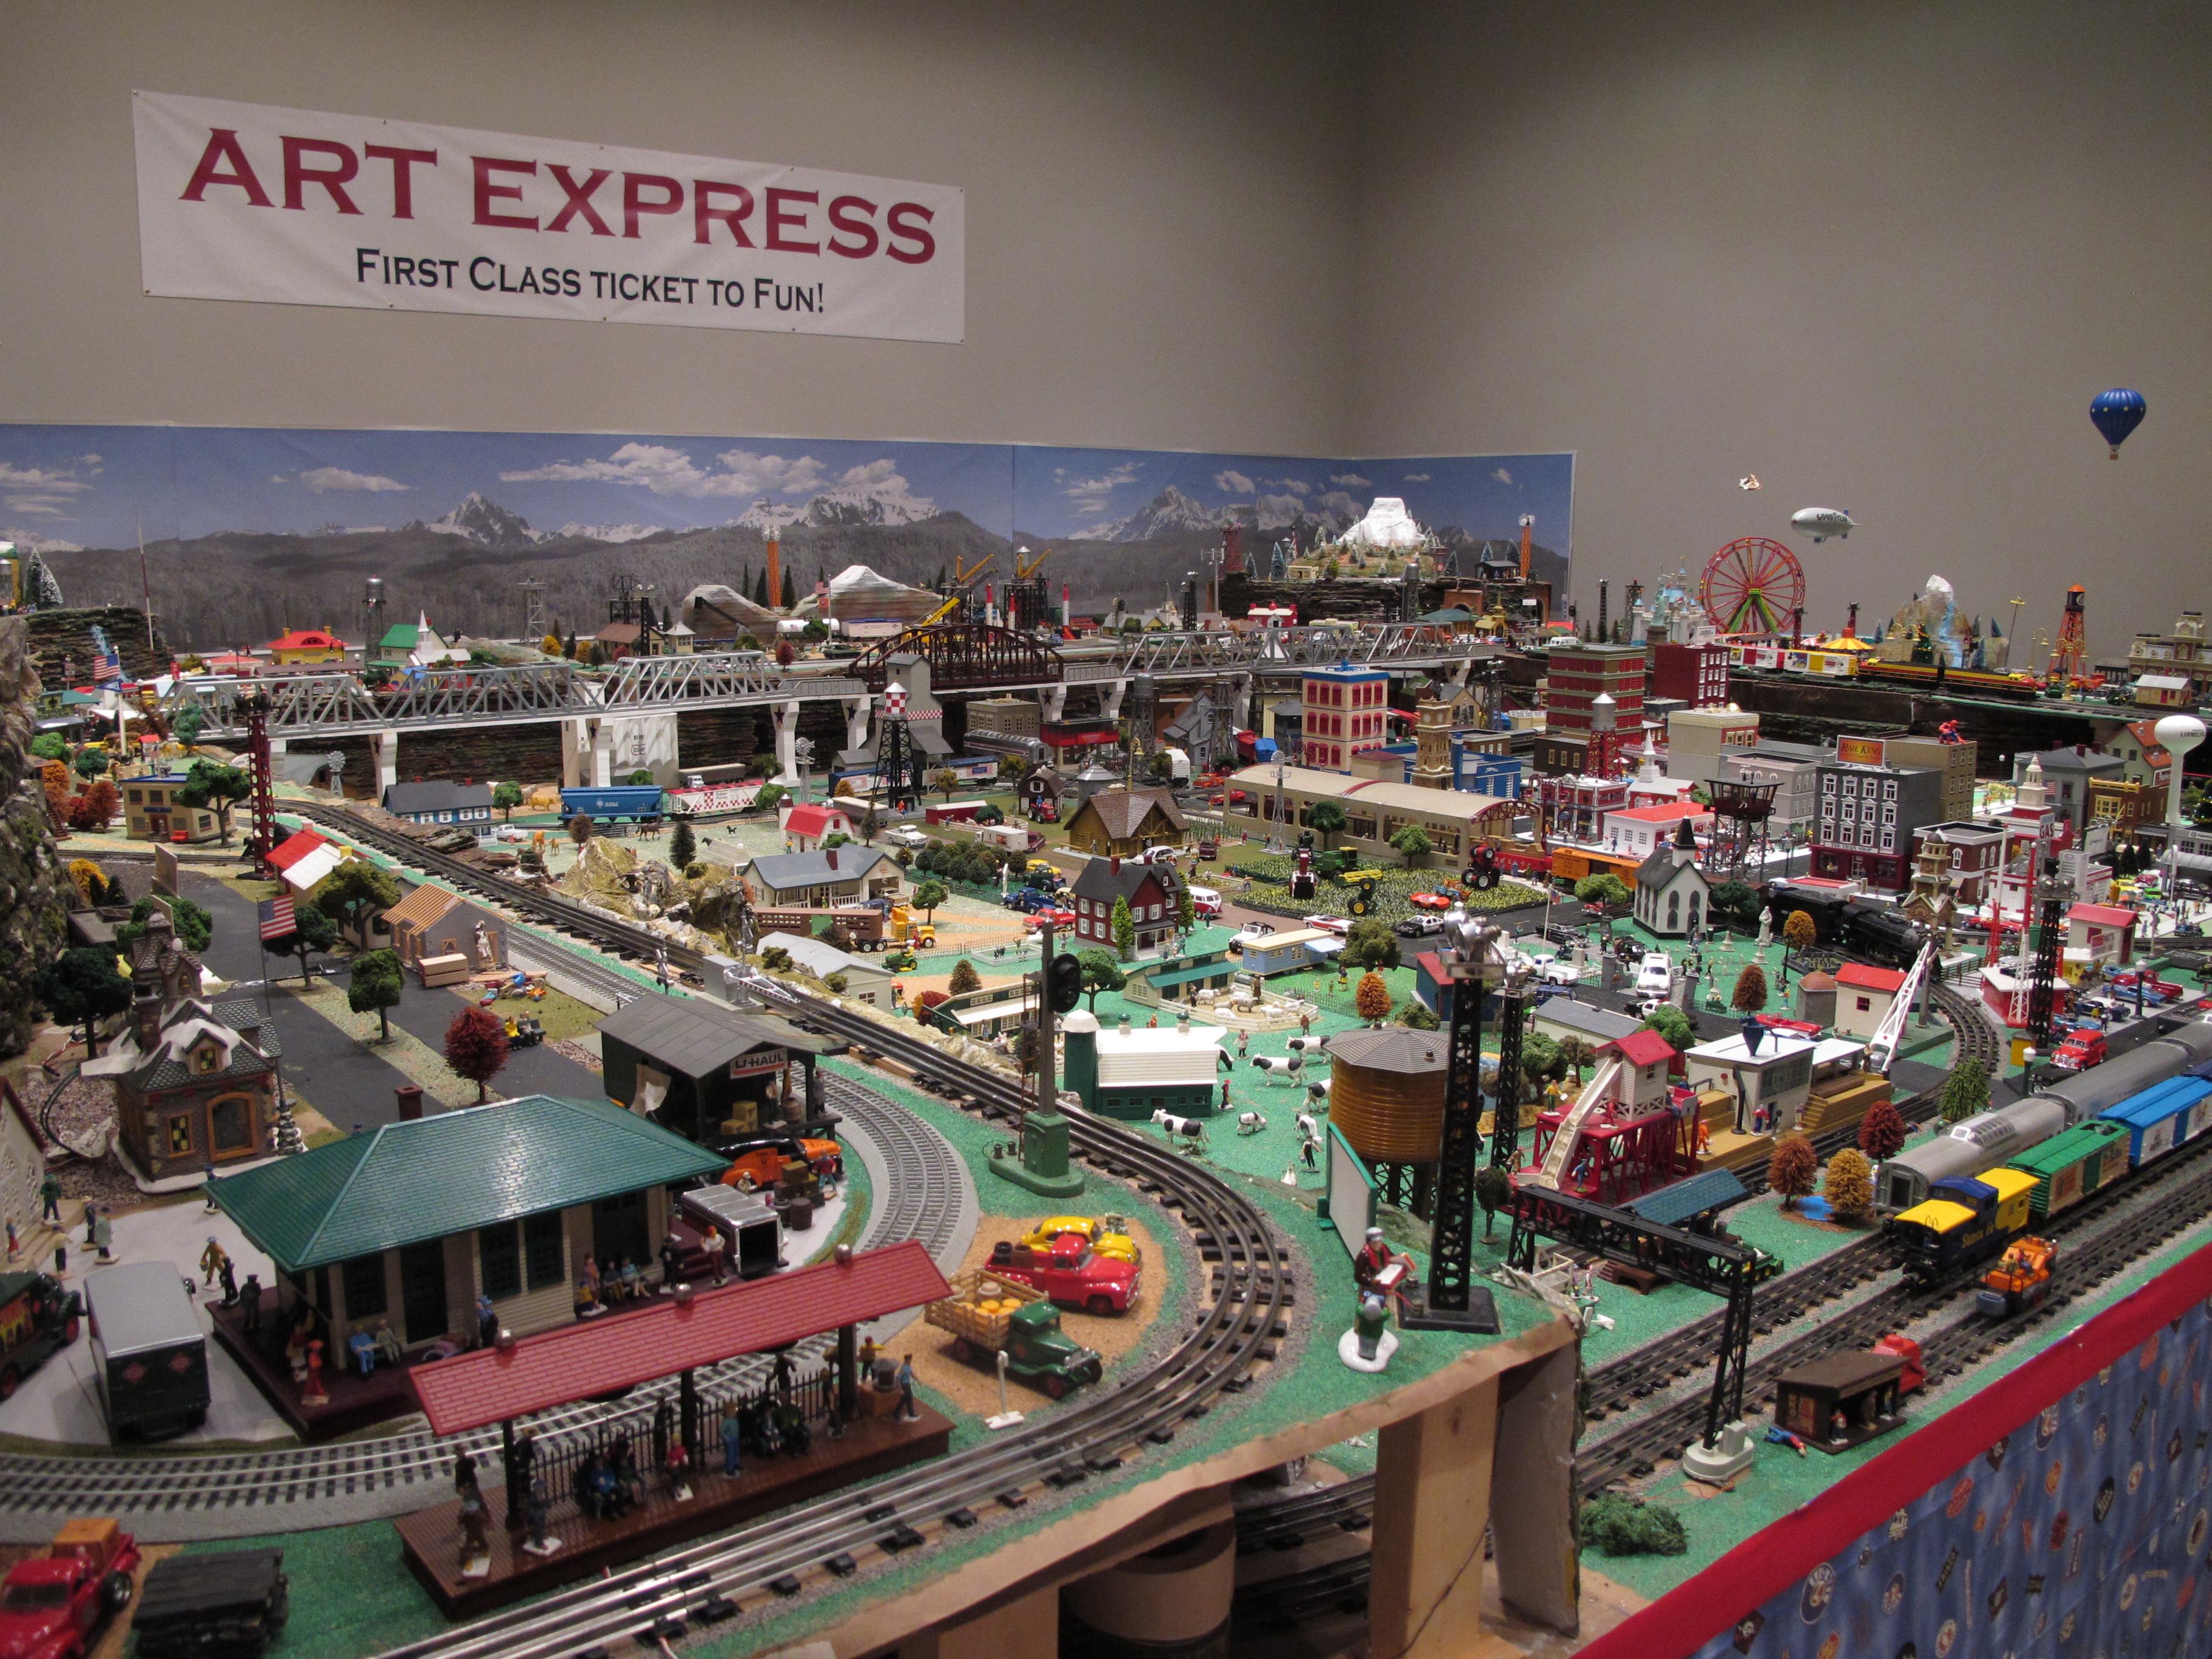 Art Express exhibit opens today